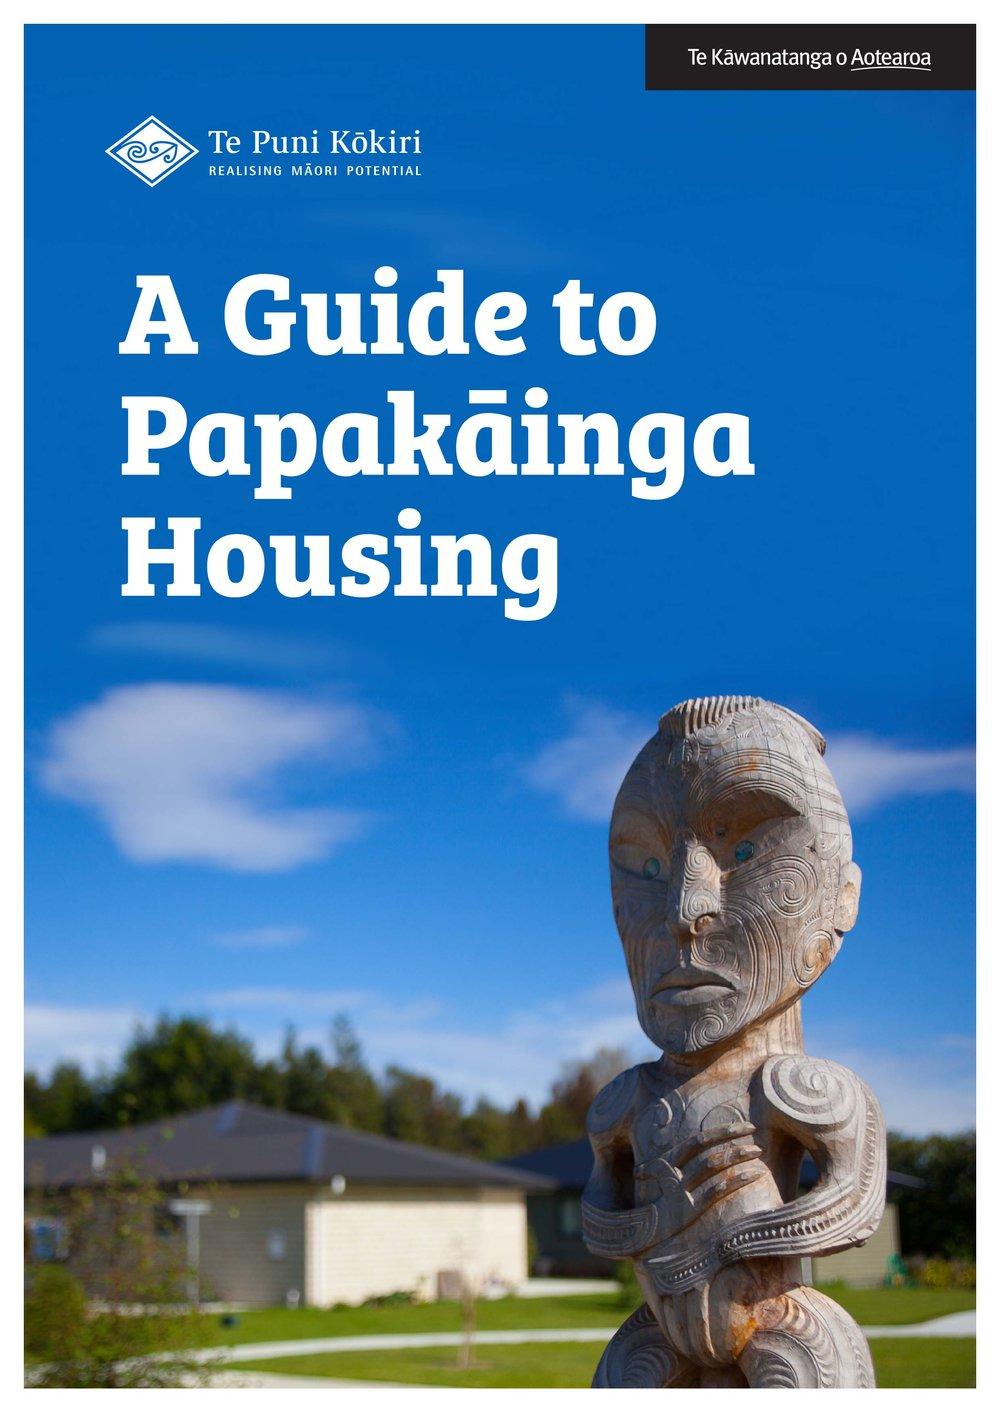 tpk-guide-papakāinga-housing-2017-1.jpg